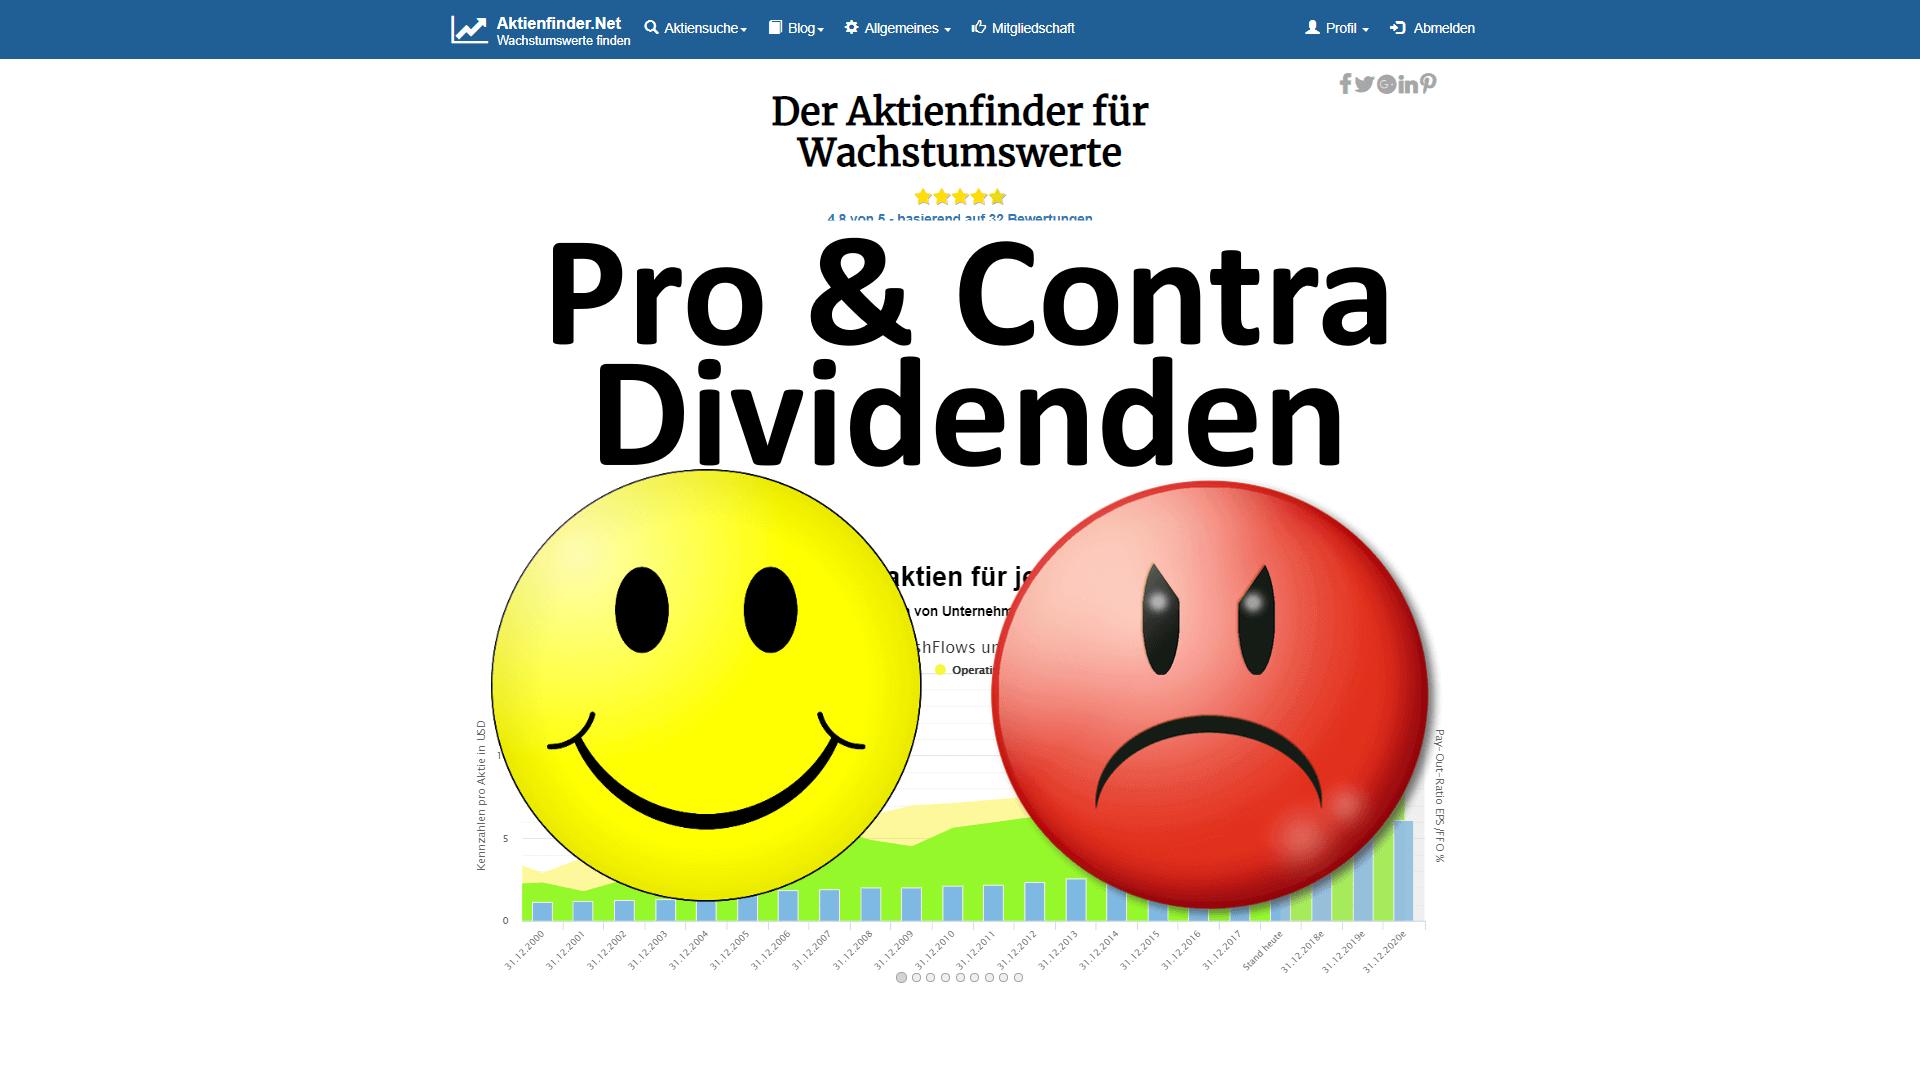 Pro & Contra Dividenden